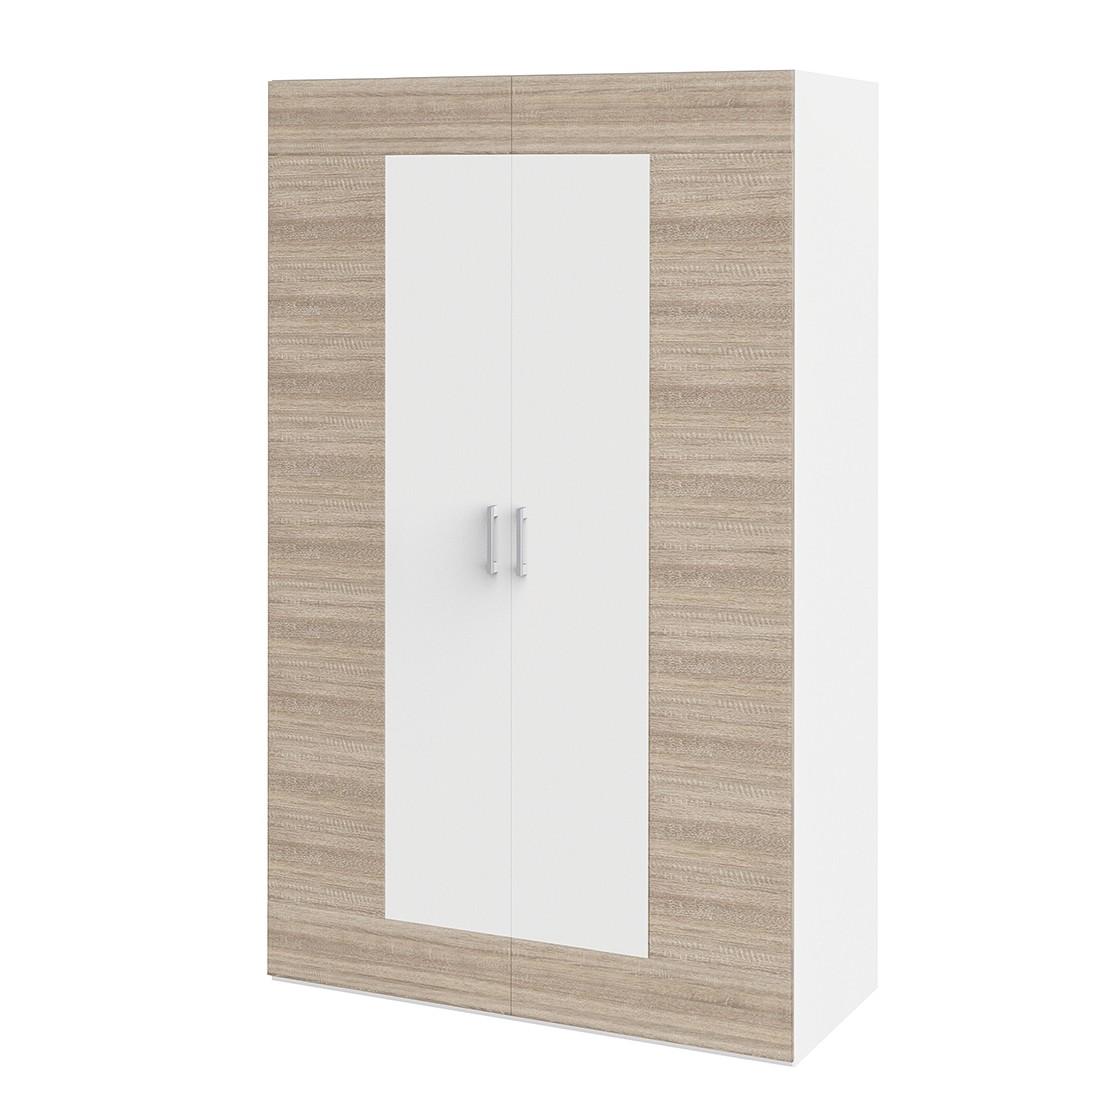 Kledingkast Vegas Plus I - 126 cm (2-deurs), röhr